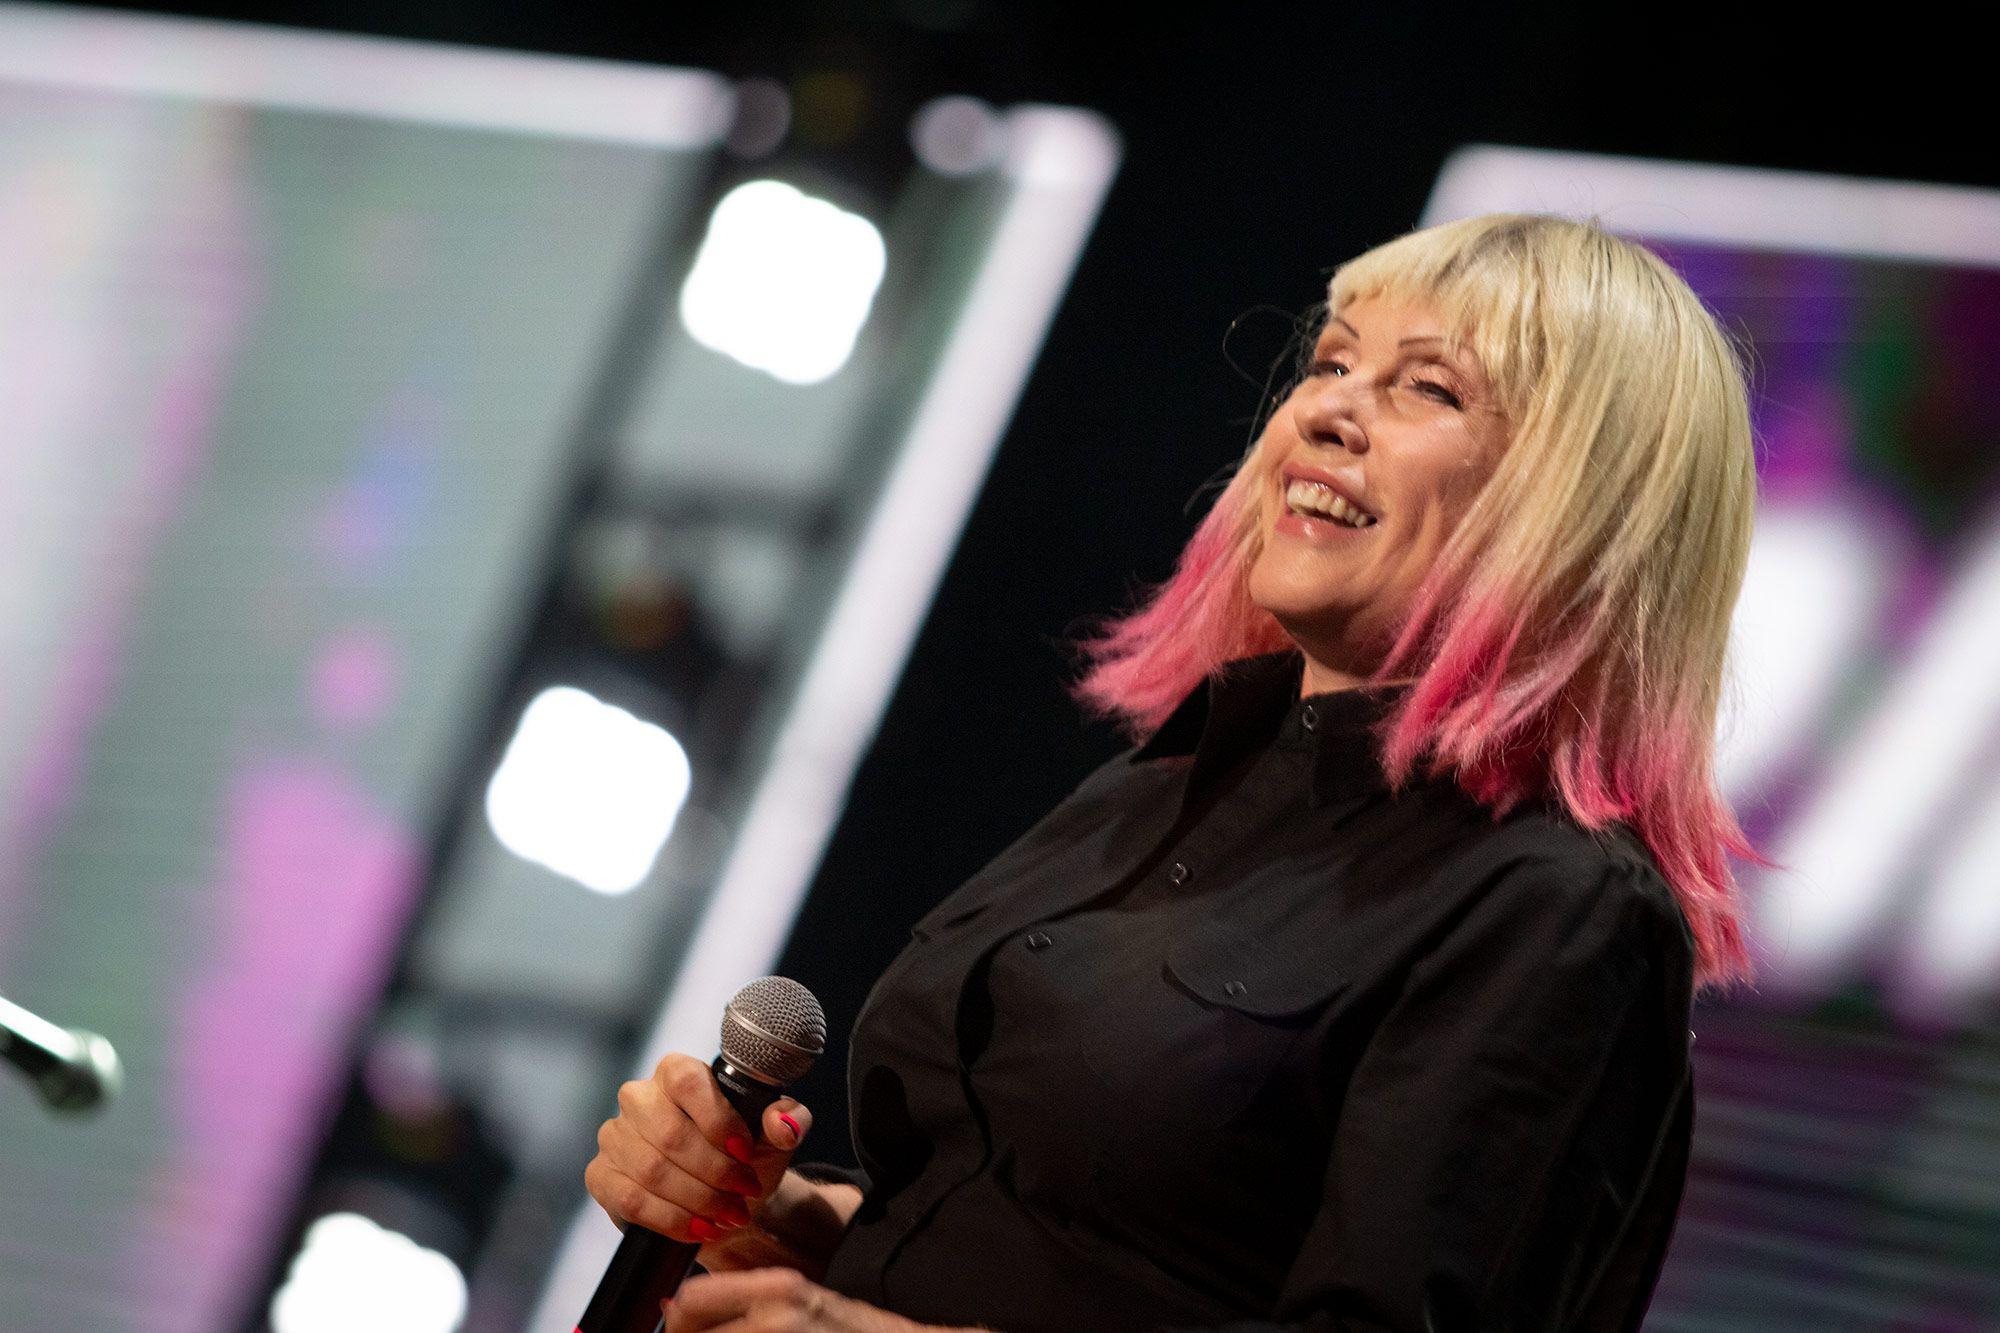 Blondie se presentó en el marco del Festival Rock and Pop 2018